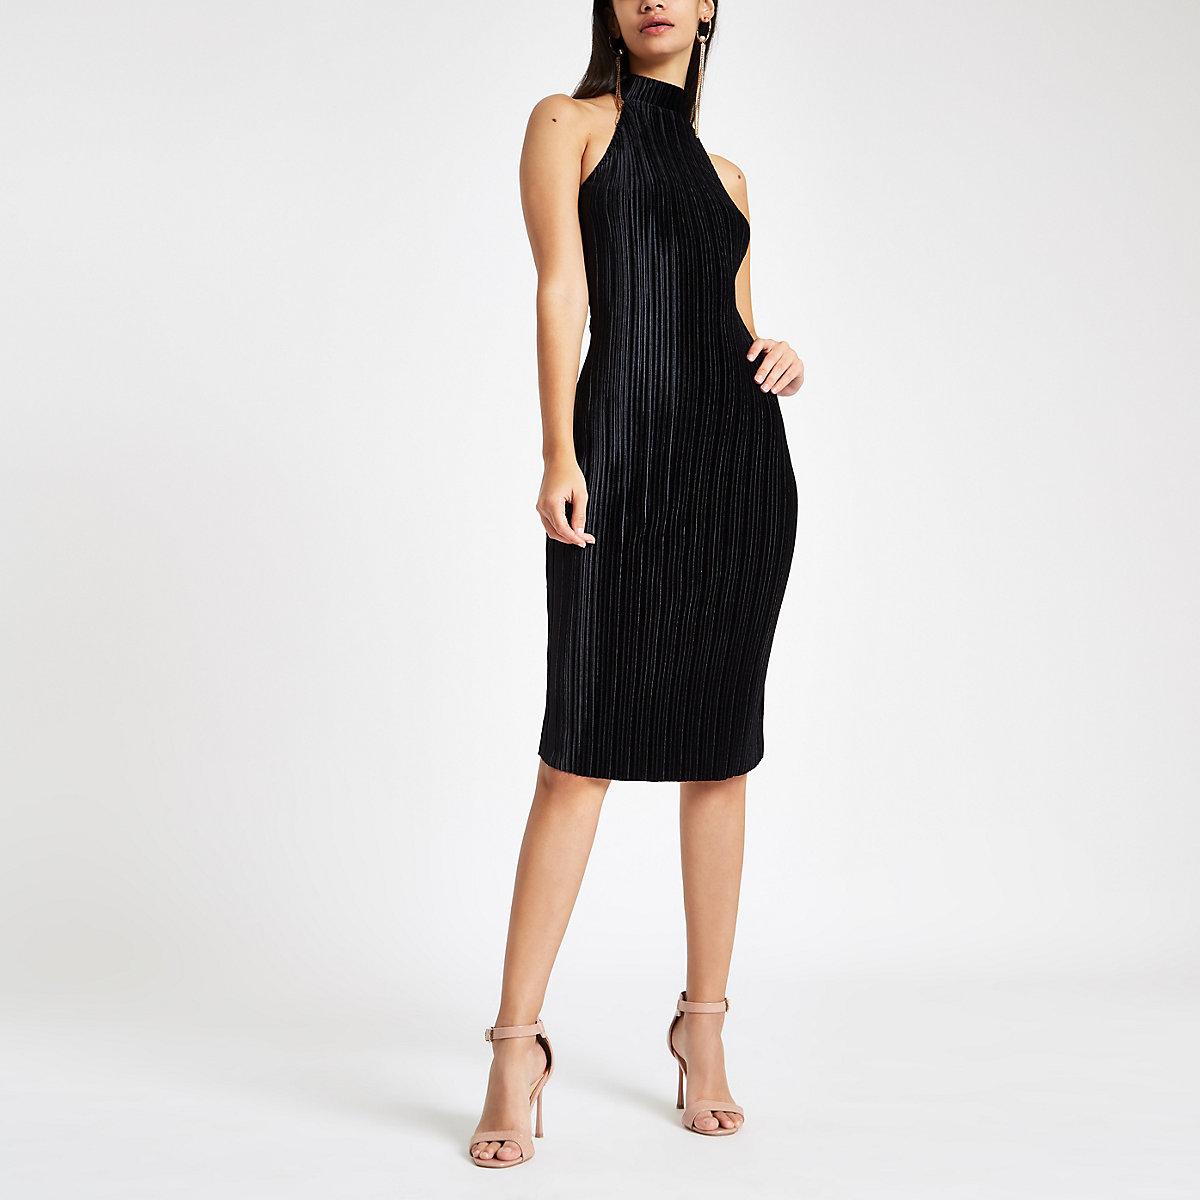 Black plisse halter neck bodycon midi dress